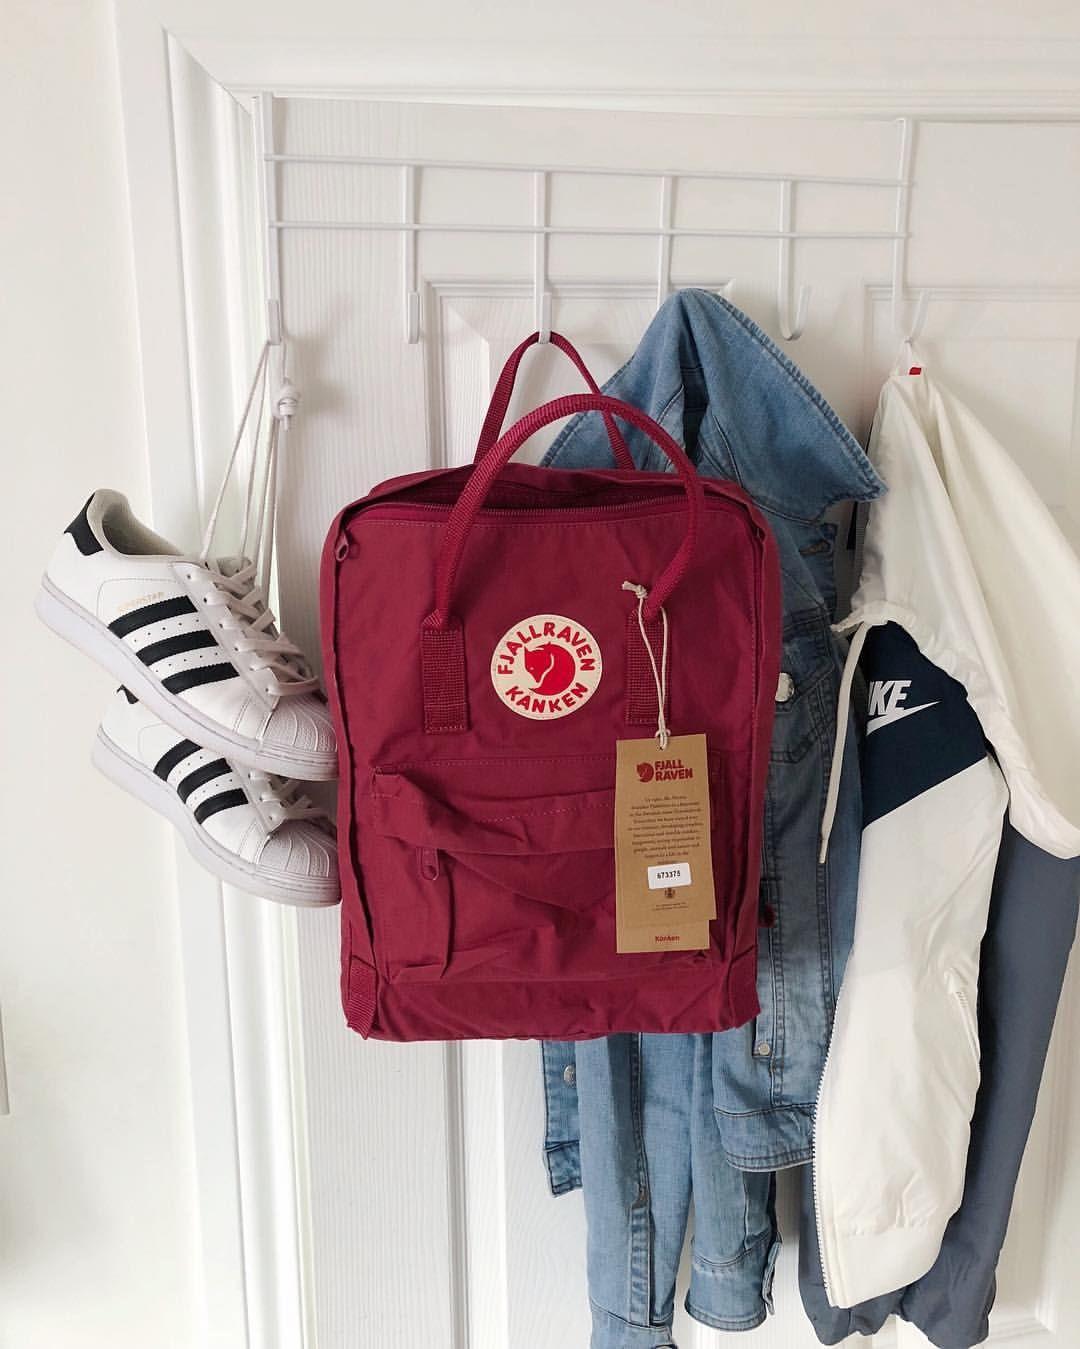 Fjallraven Kanken Backpack em 2020 | Mochila, Mochila kanken